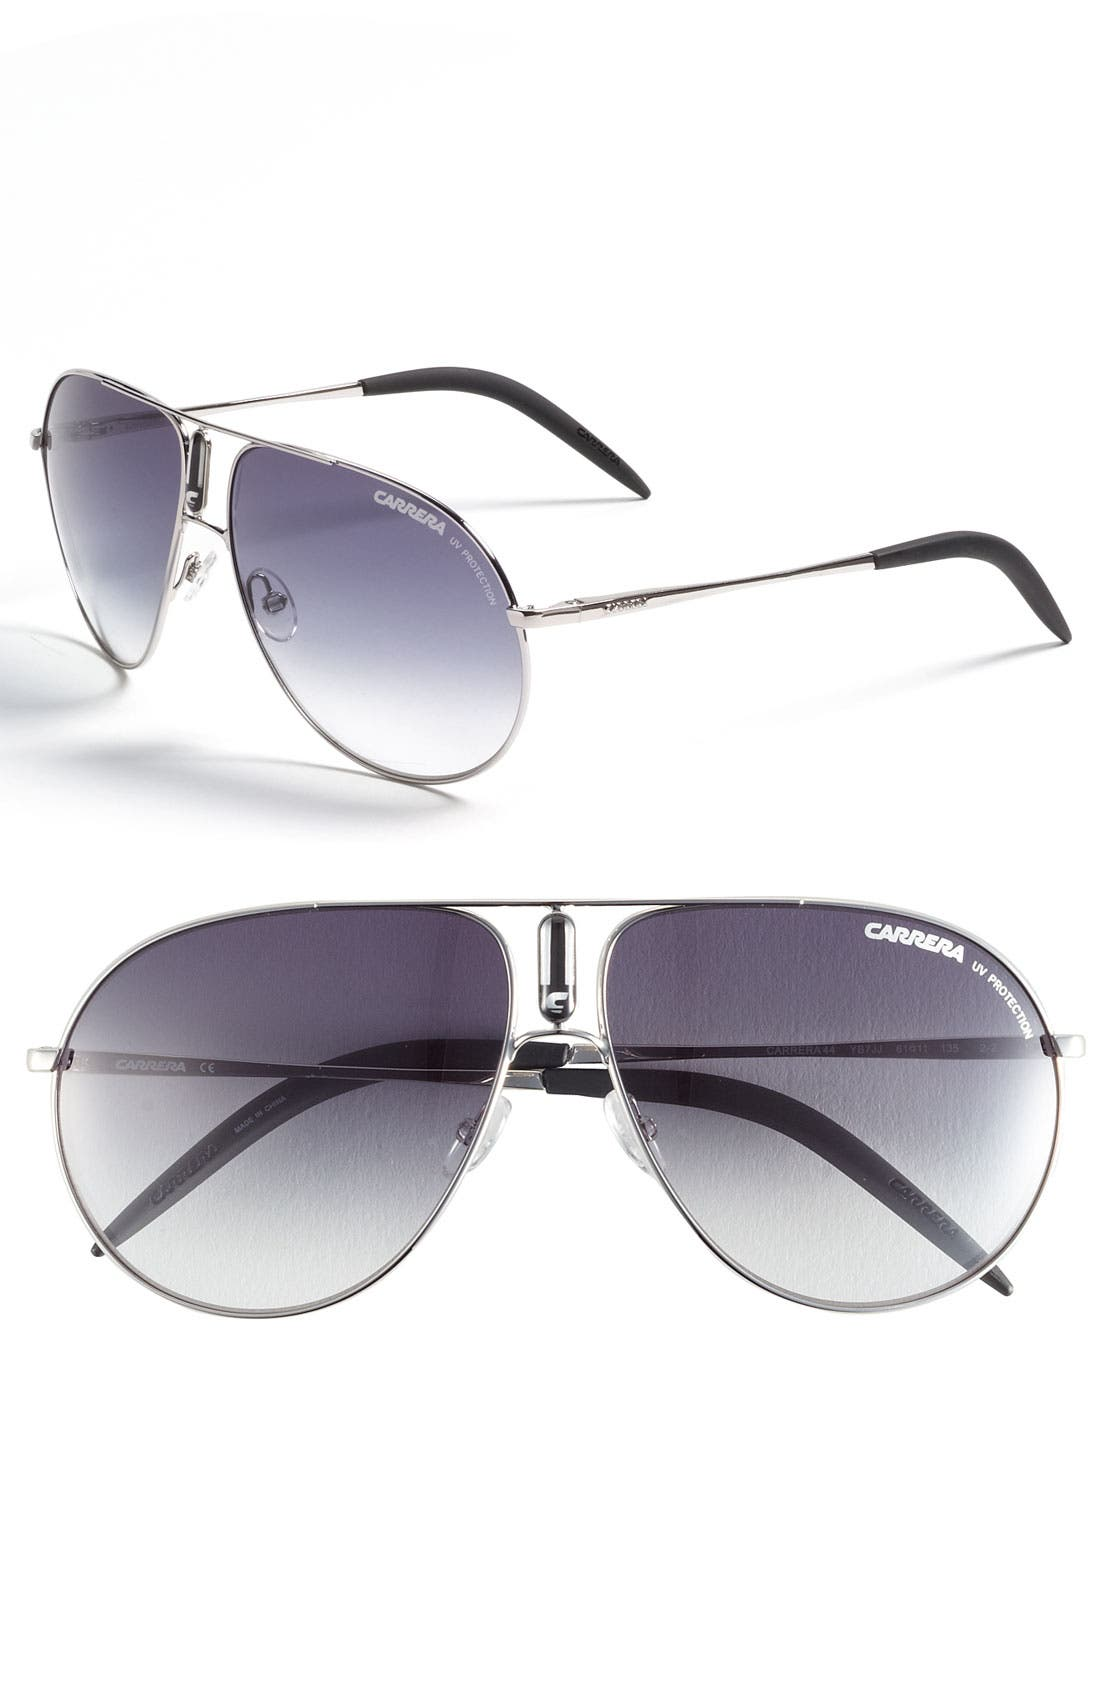 Main Image - Carrera Eyewear 61mm Aviator Sunglasses